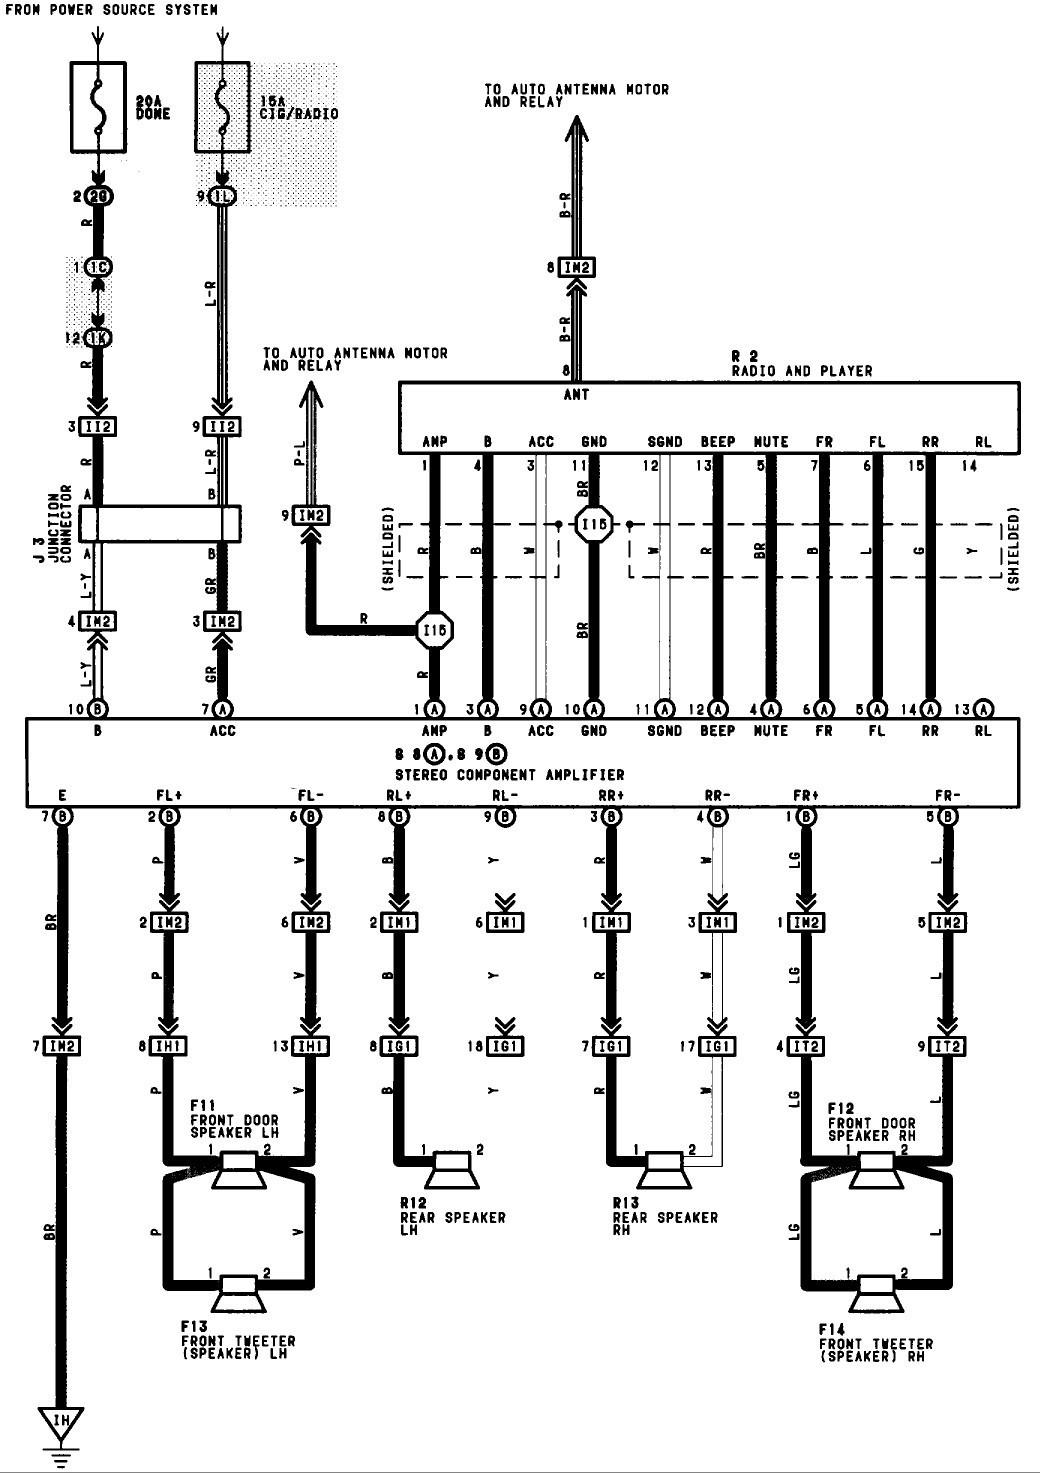 1996 toyota Camry Wiring Diagram   Free Wiring Diagram